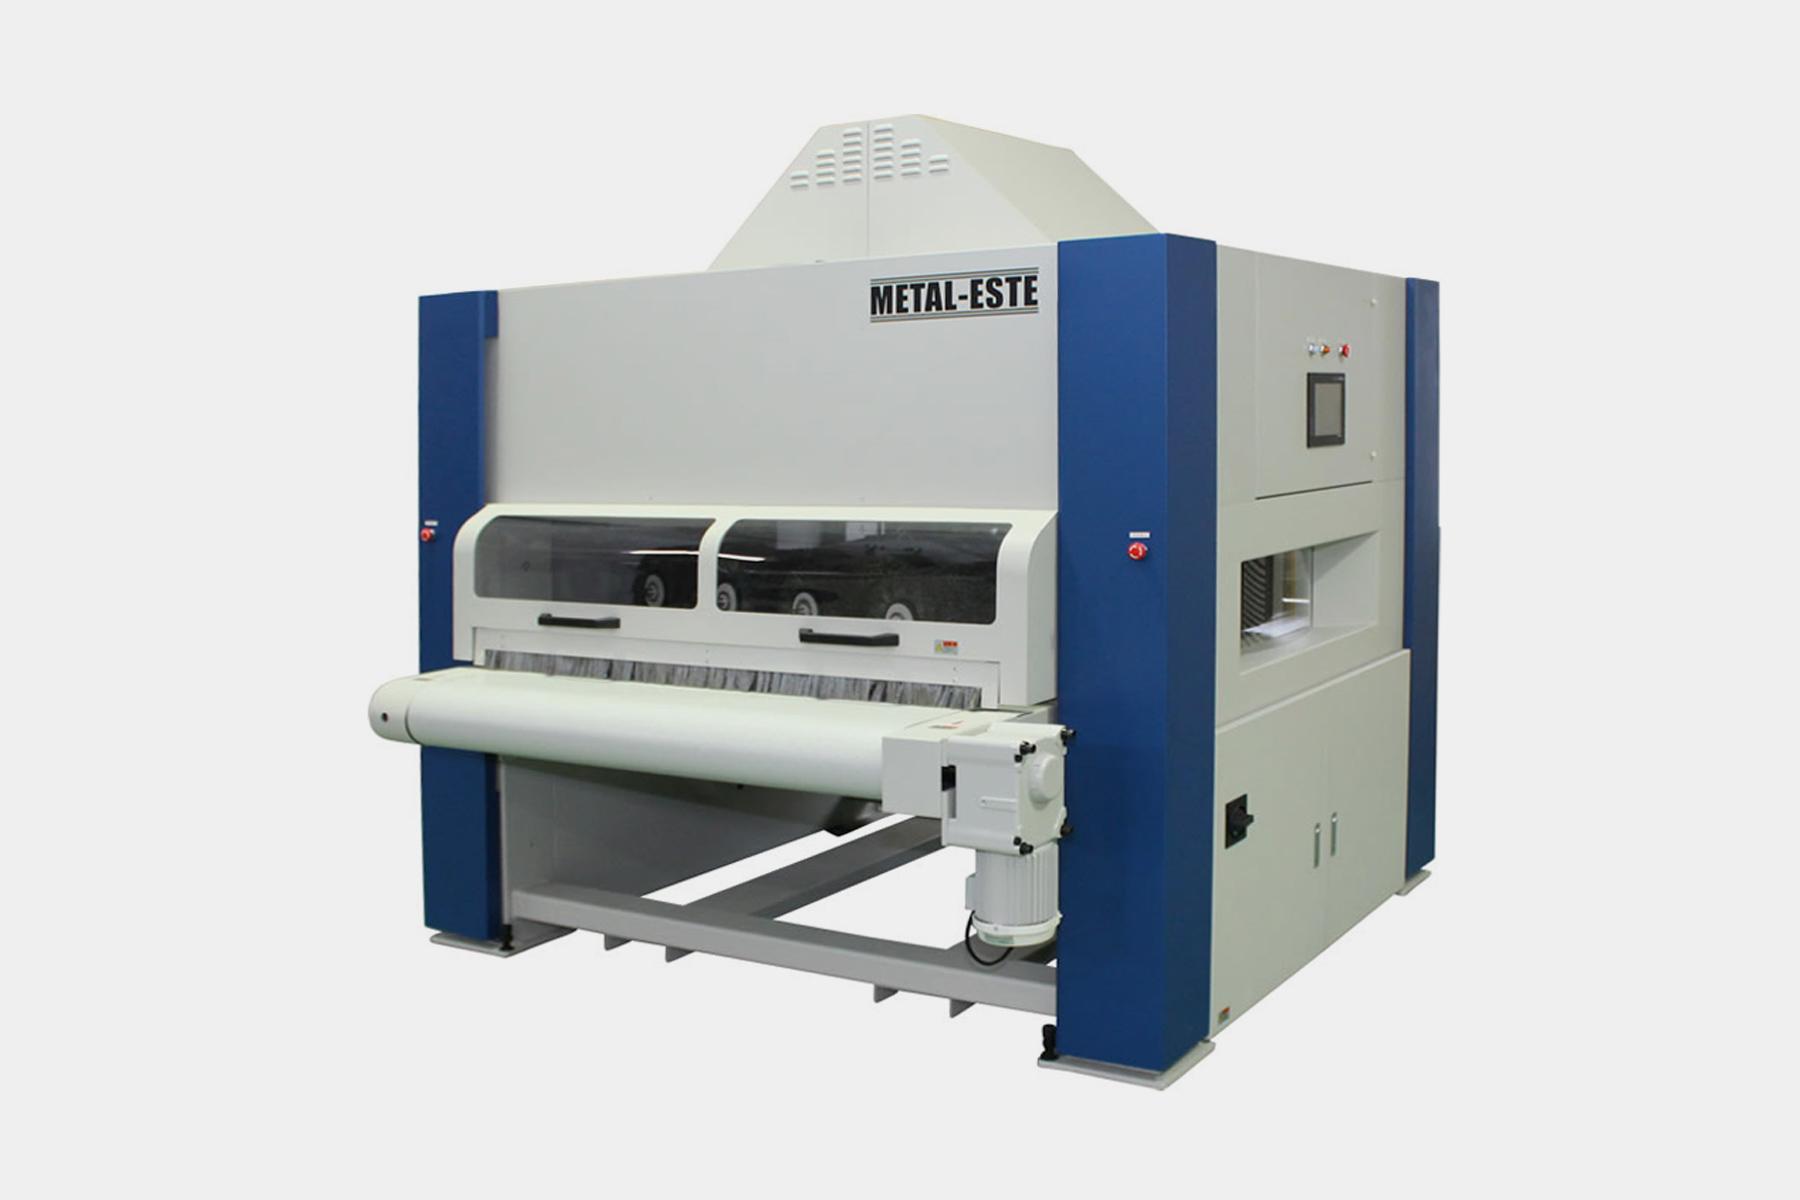 METAL ESTE 1300